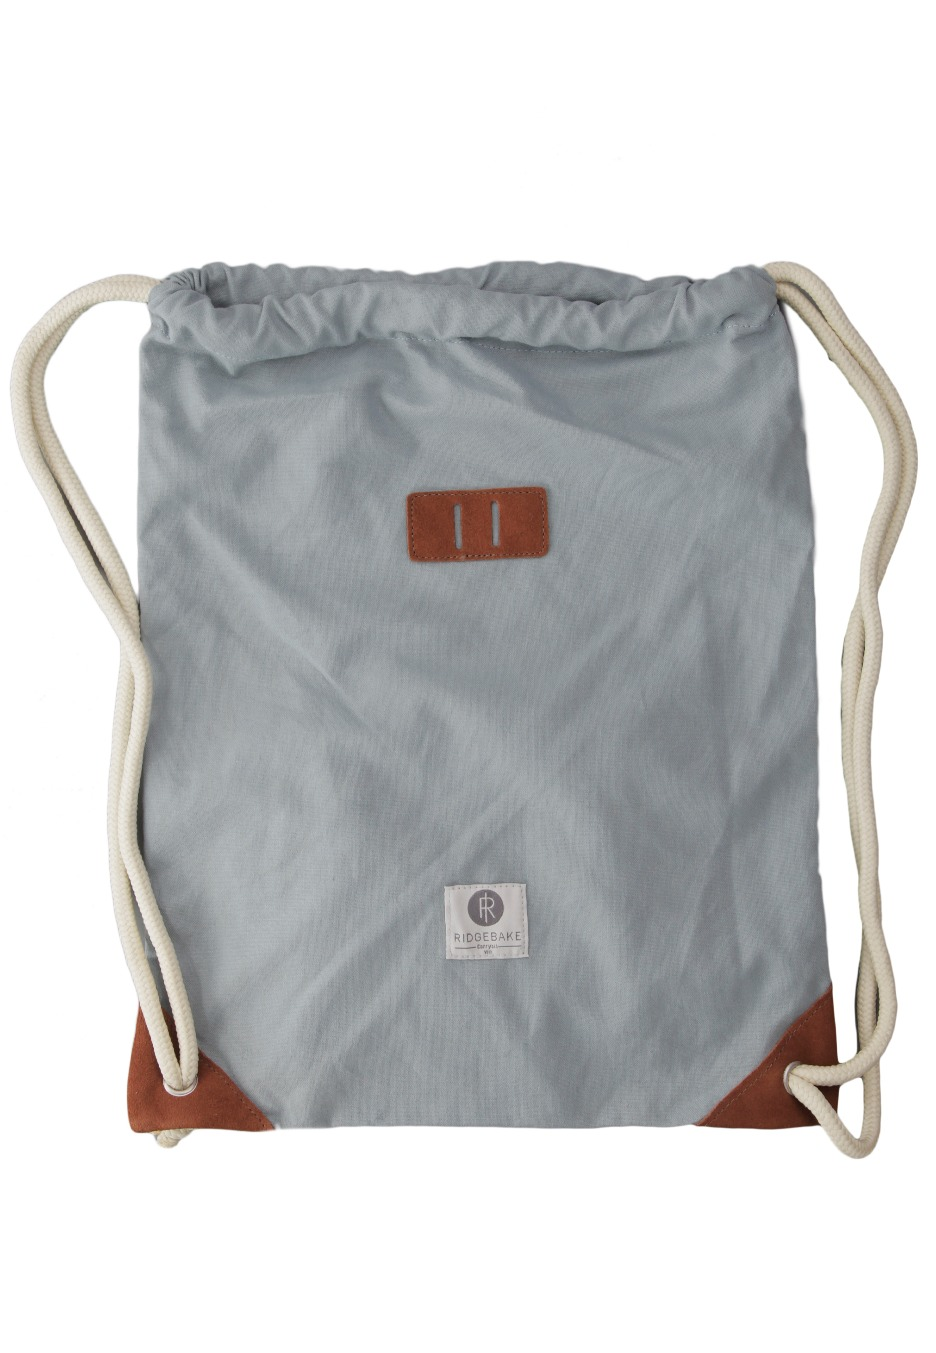 Ridgebake - Super Rich Pauli Pastel Blue Drawstring - Backpack - Streetwear  Shop - Impericon.com Worldwide 254ddd50b442c